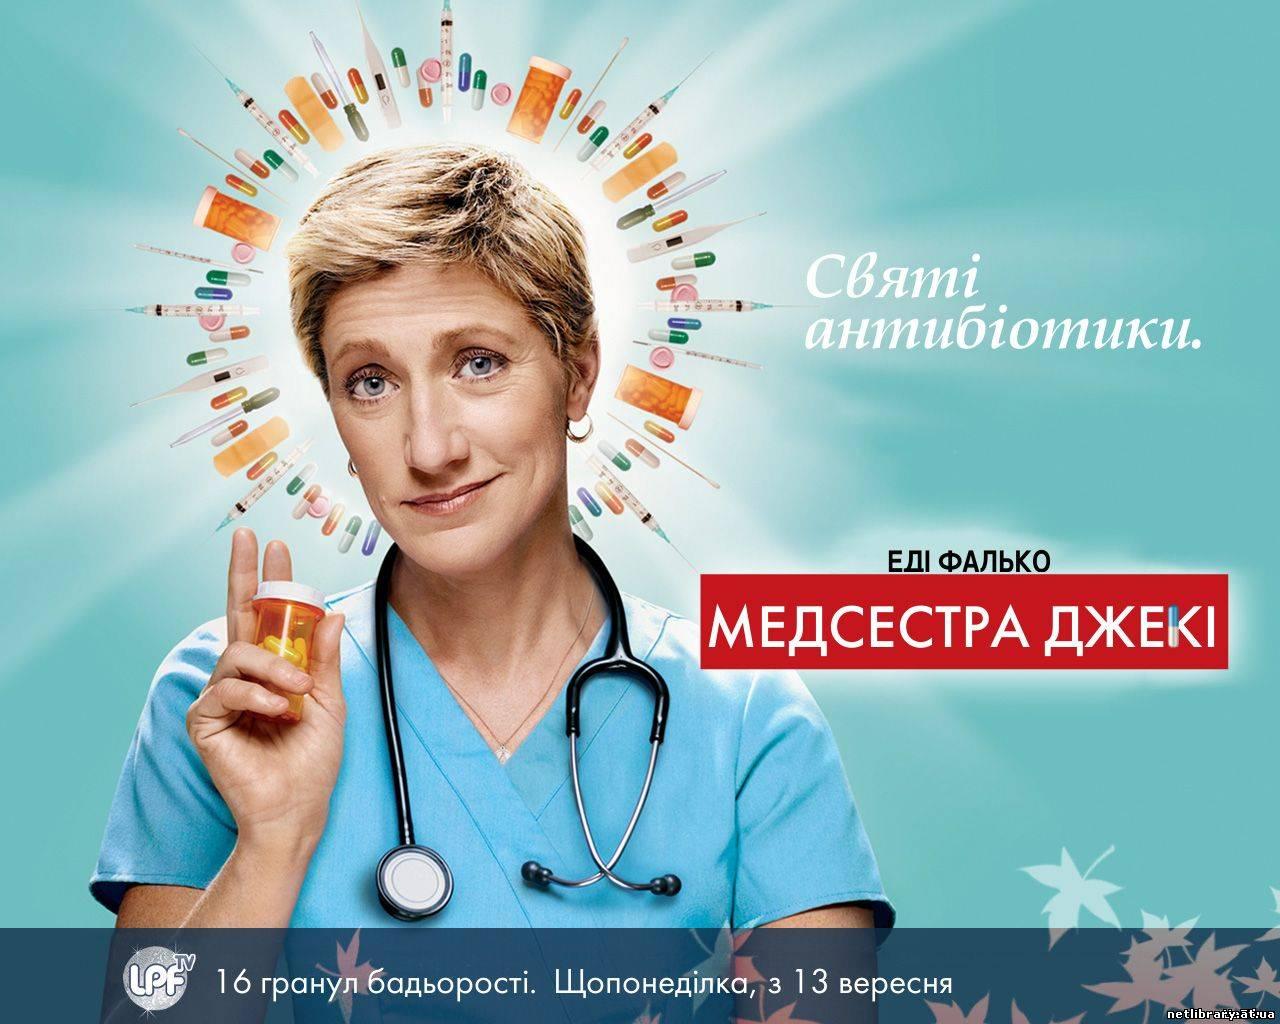 Медсестра Джекі (Сезон 1) / Nurse Jackie (Season 1) (2009) укр дубляж онлайн